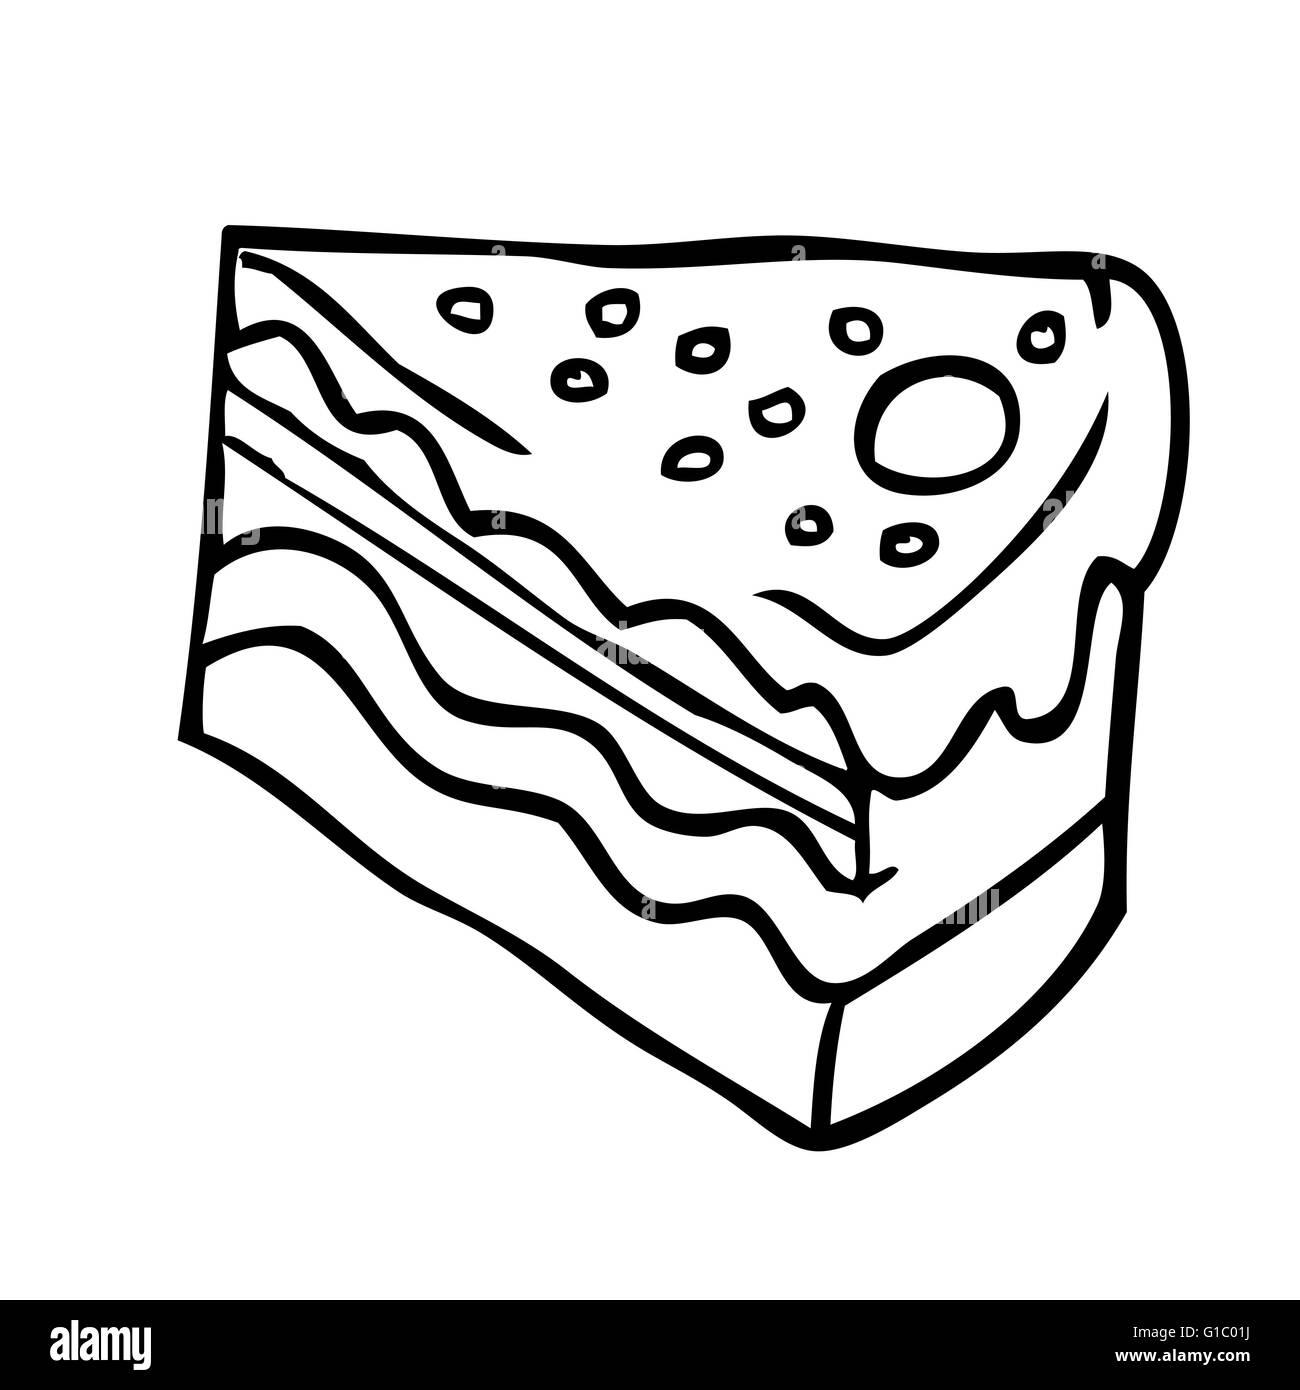 Einfache Schwarz Weiss Stuck Kuchen Cartoon Vektor Abbildung Bild